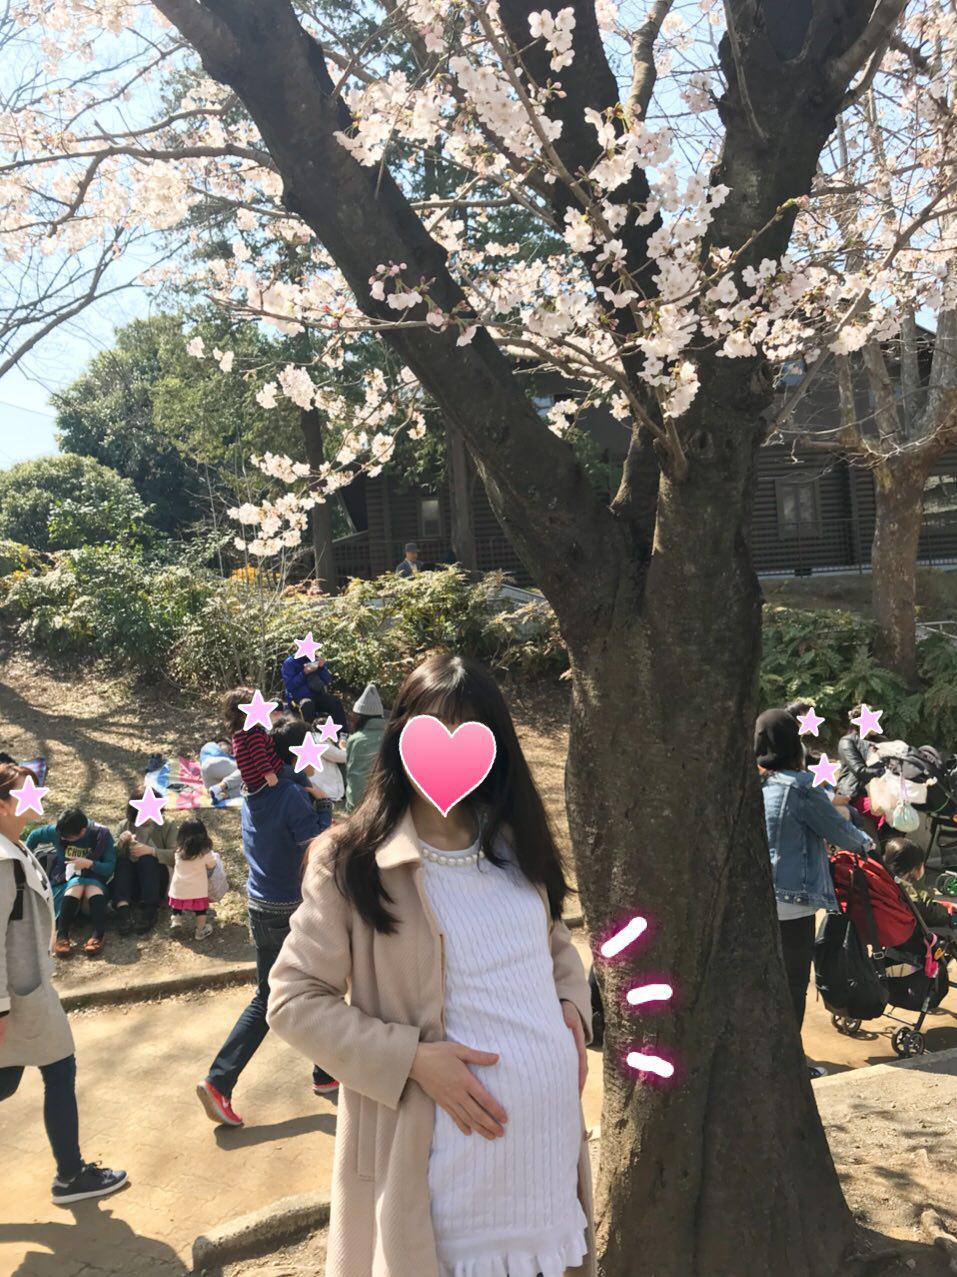 photo_2018-03-25_21-31-44.jpg